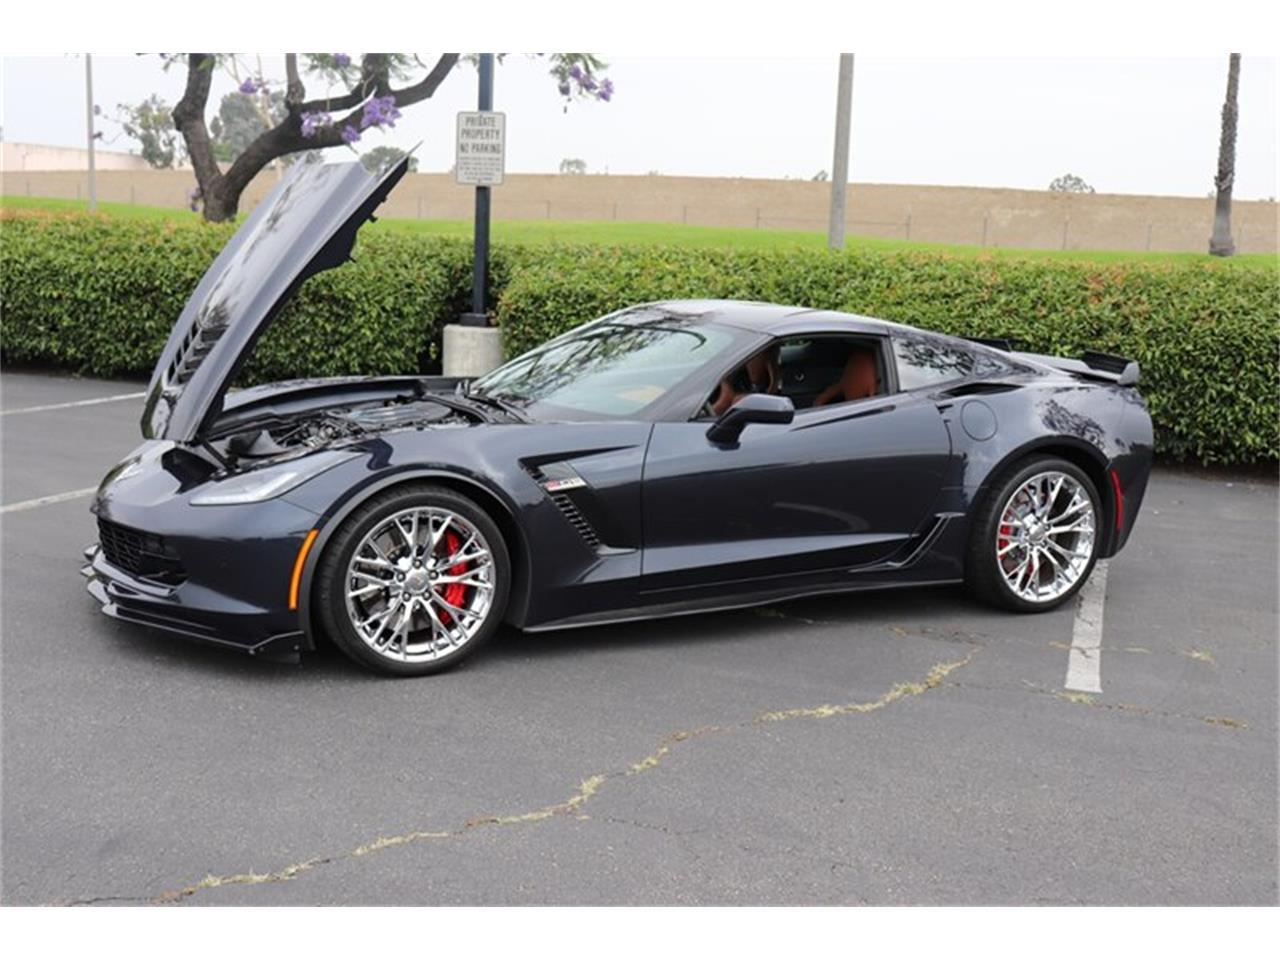 Large Picture of 2015 Chevrolet Corvette Z06 - $59,995.00 Offered by West Coast Corvettes - QFLK